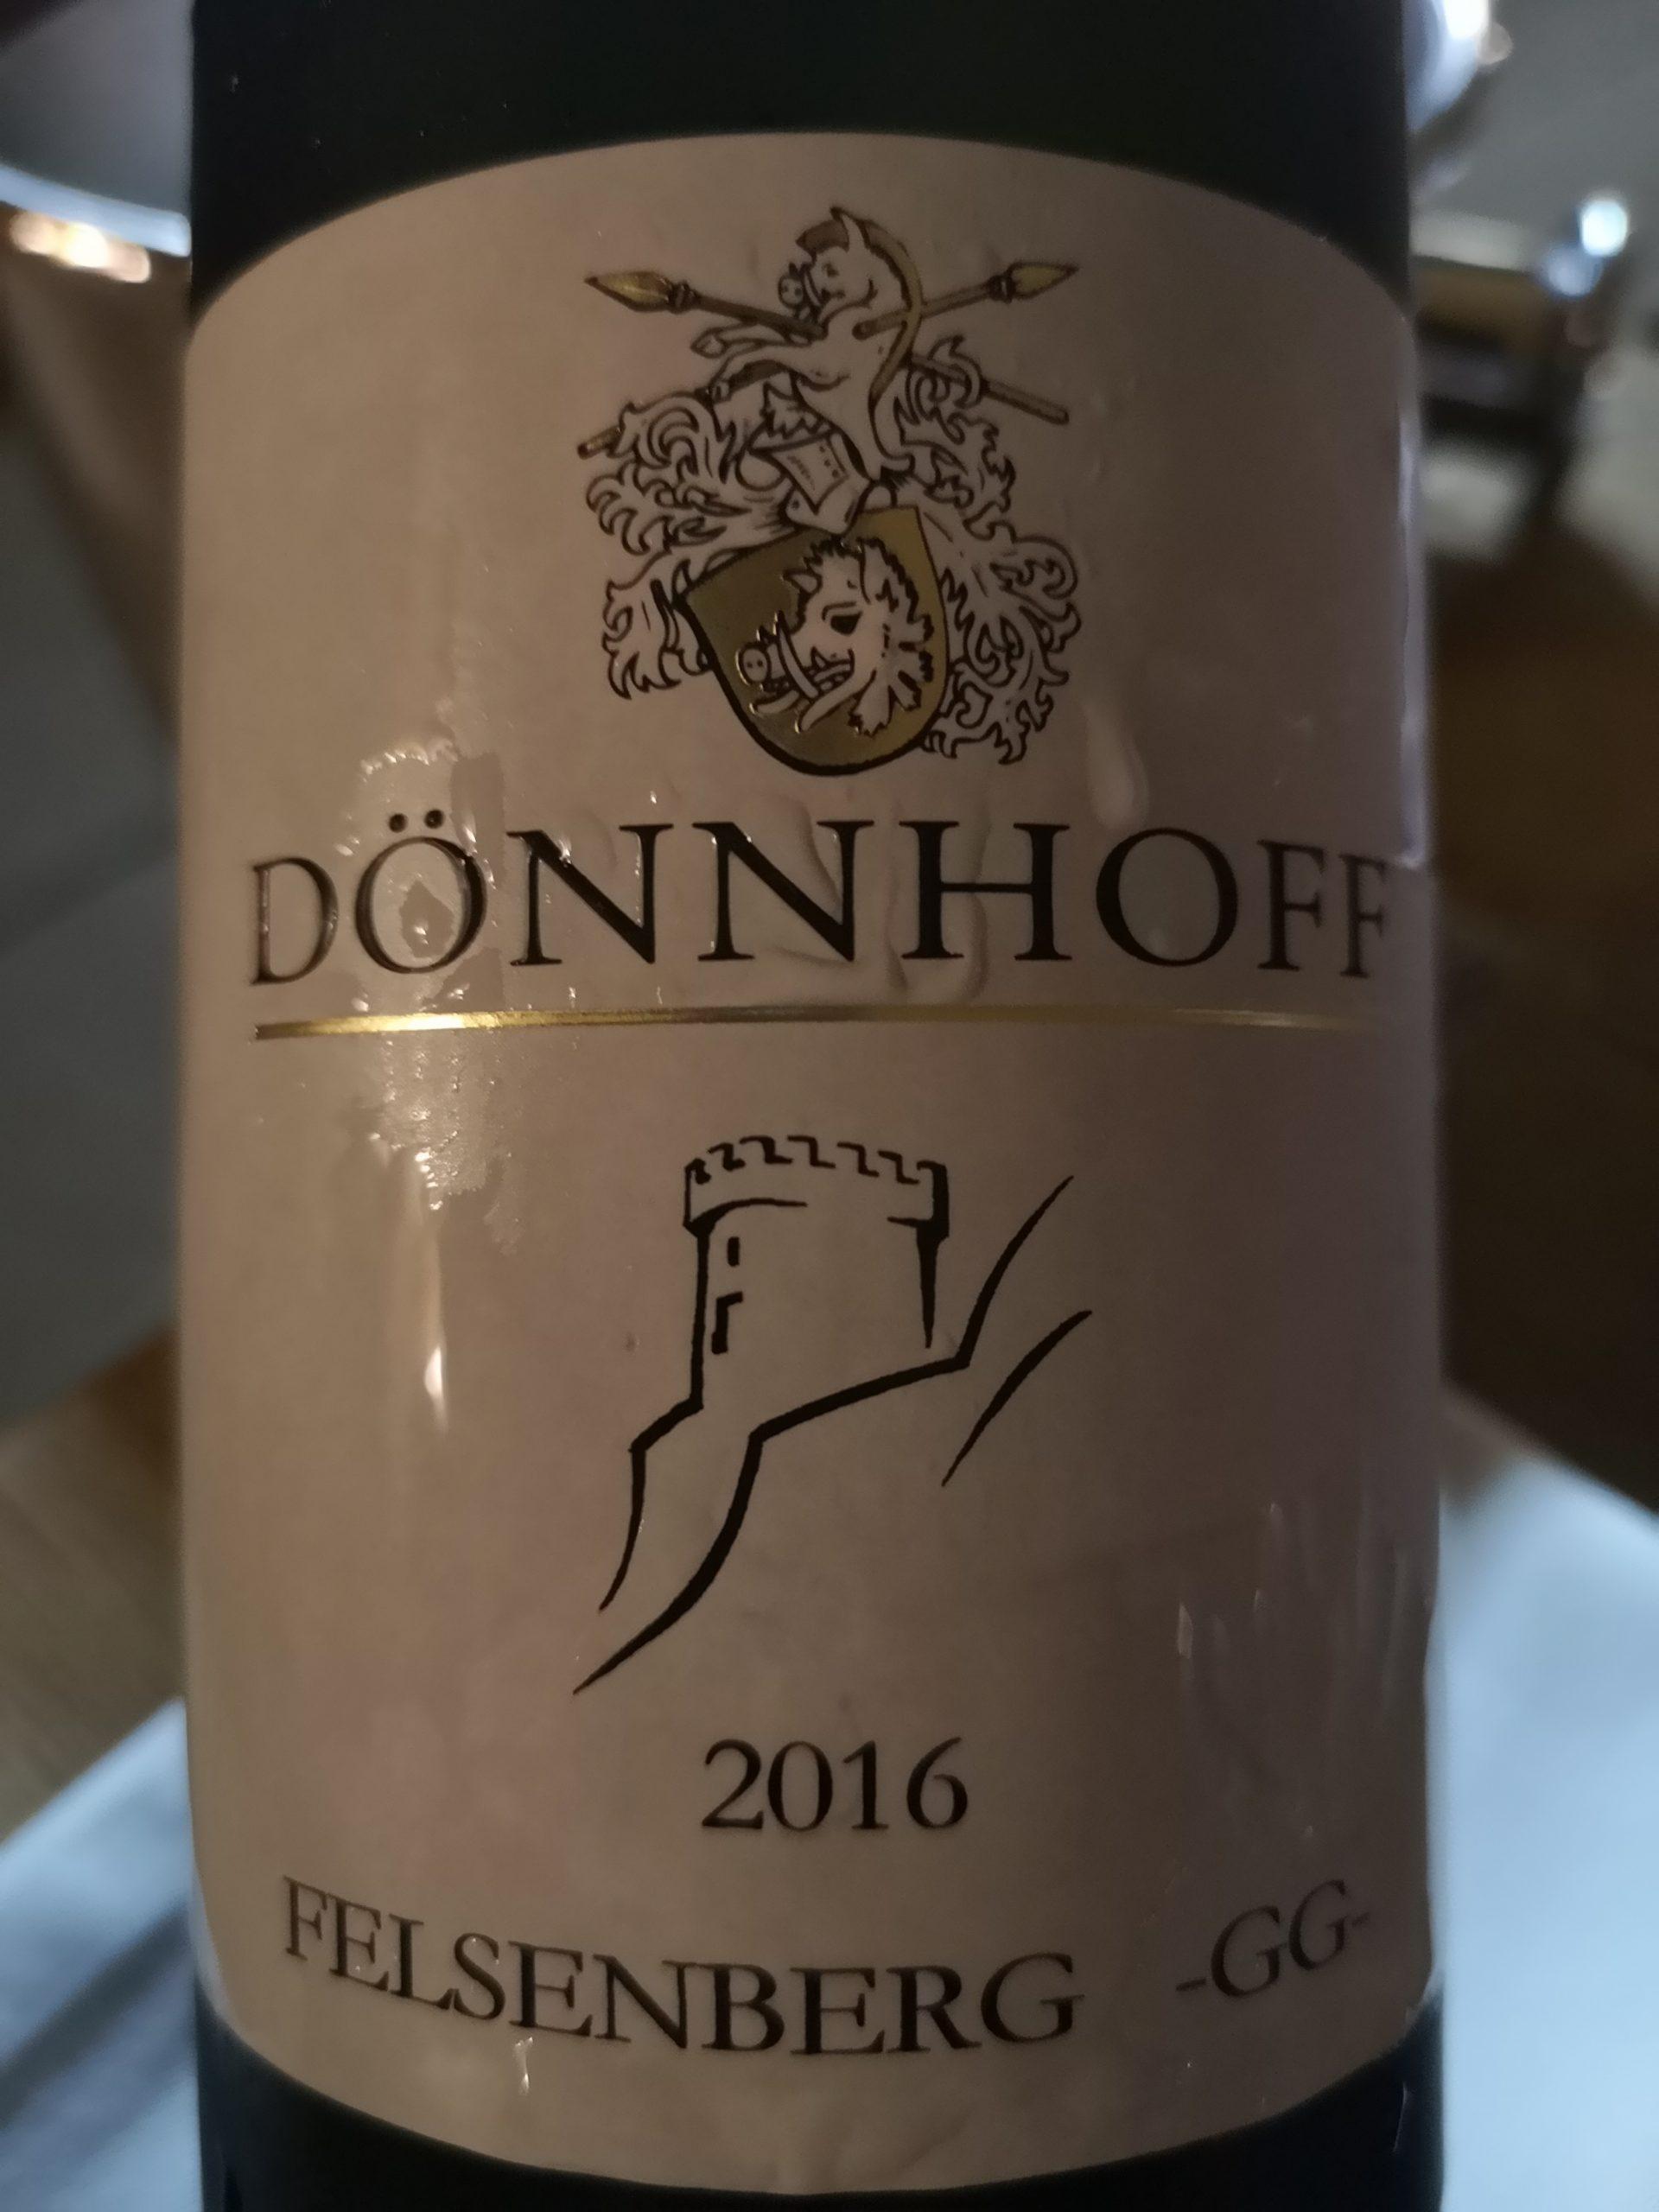 2016 Riesling Felsenberg GG | Dönnhoff